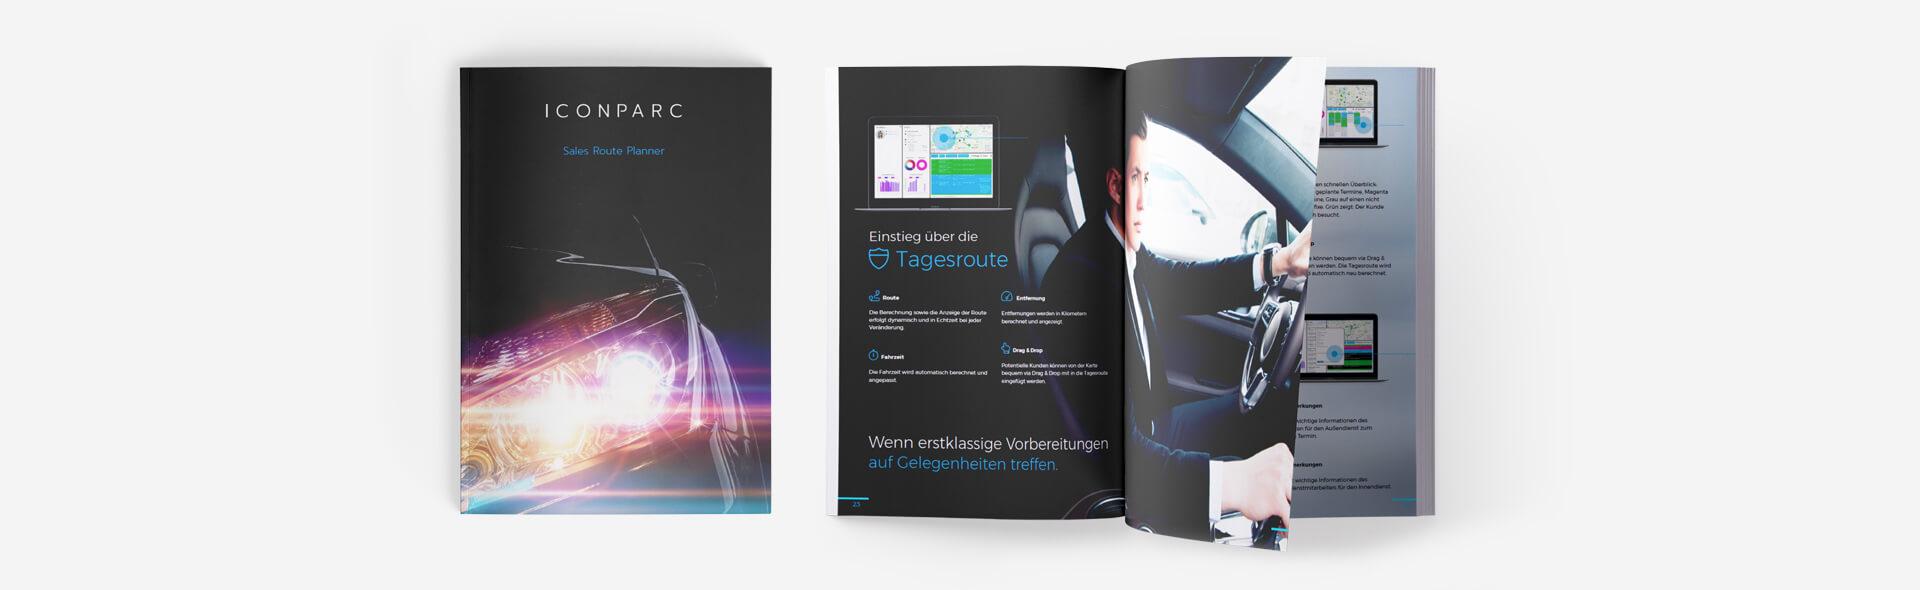 ICONPARC Tourenplanung Whitepaper PDF